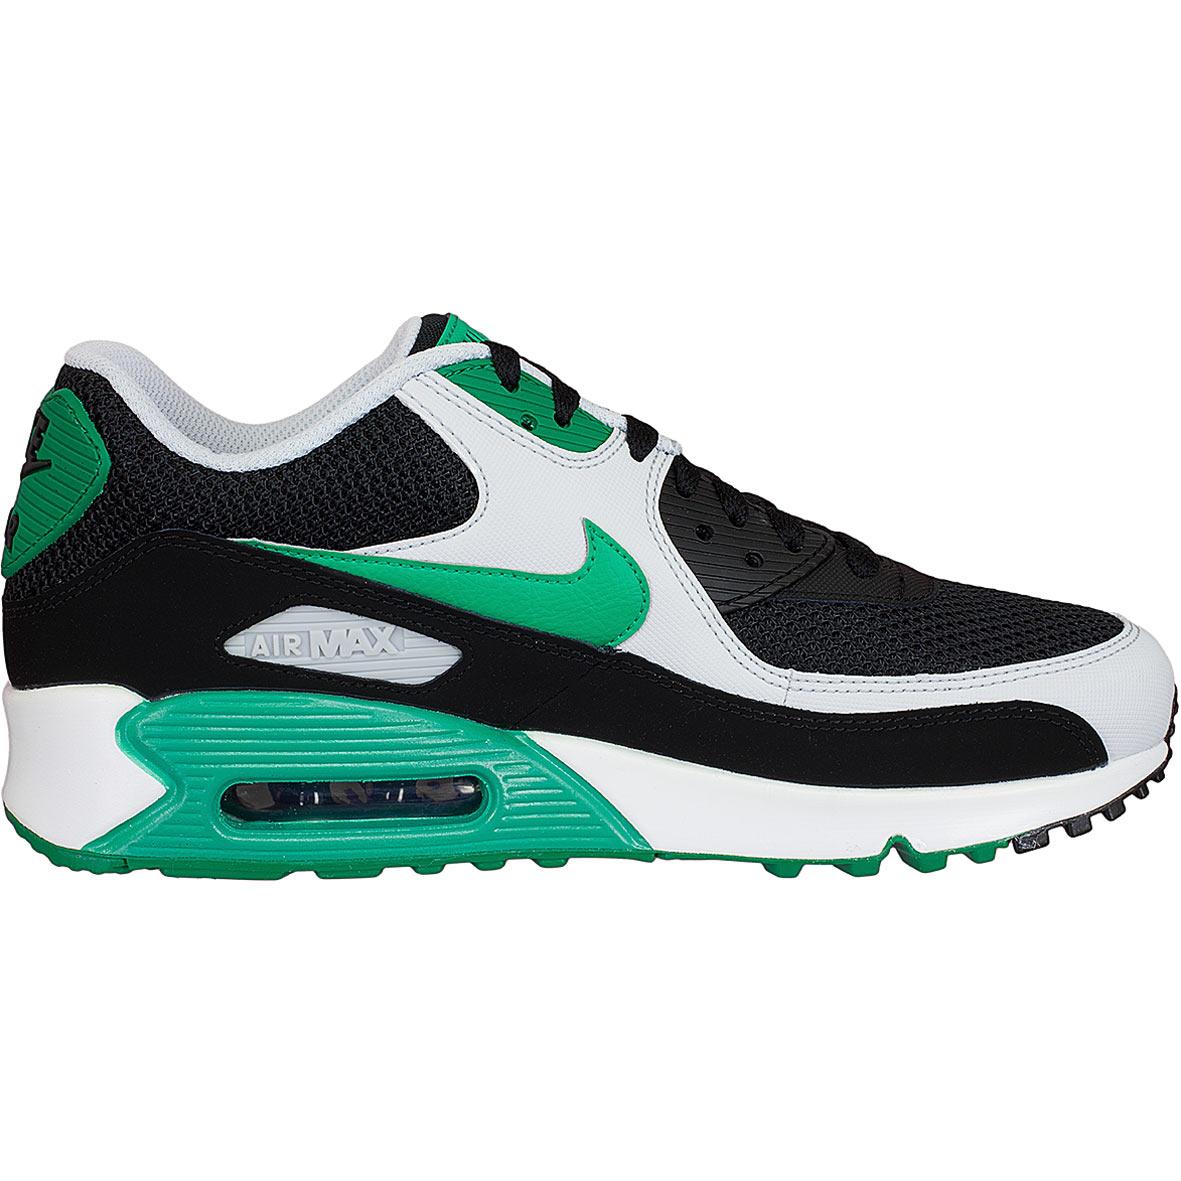 nike air max 90 essential schwarz grün weiß